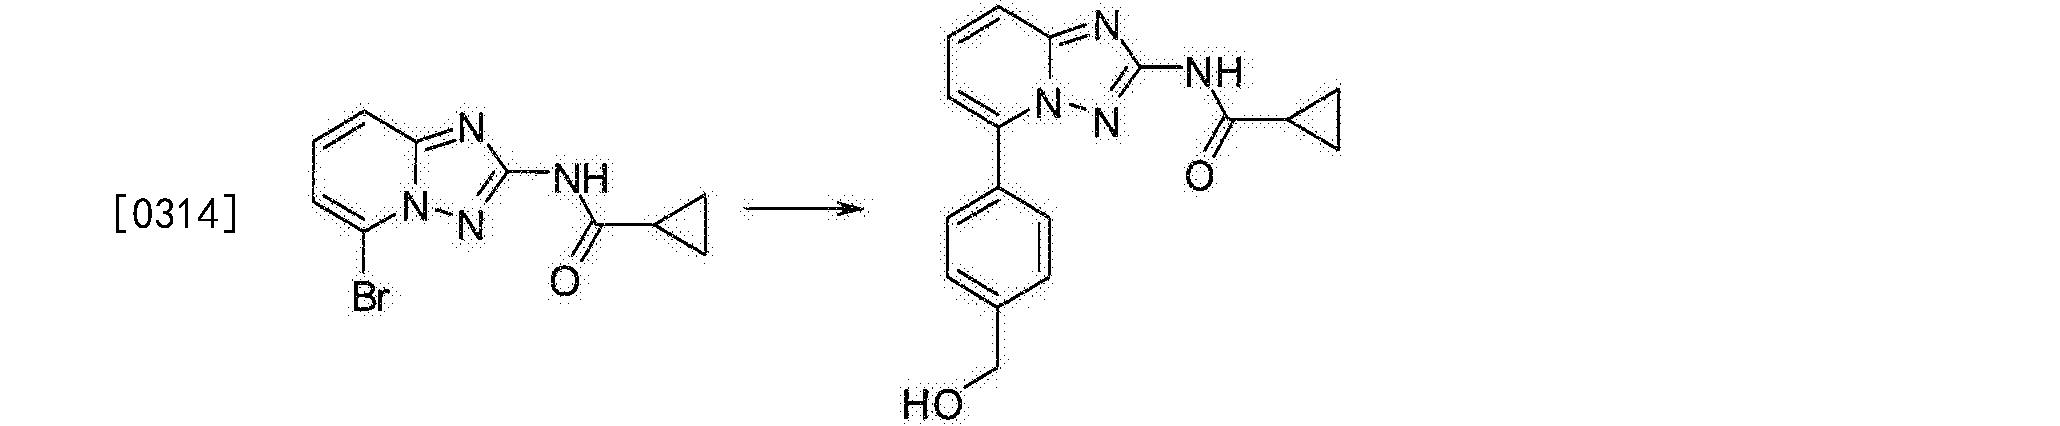 Figure CN105960407AD00351